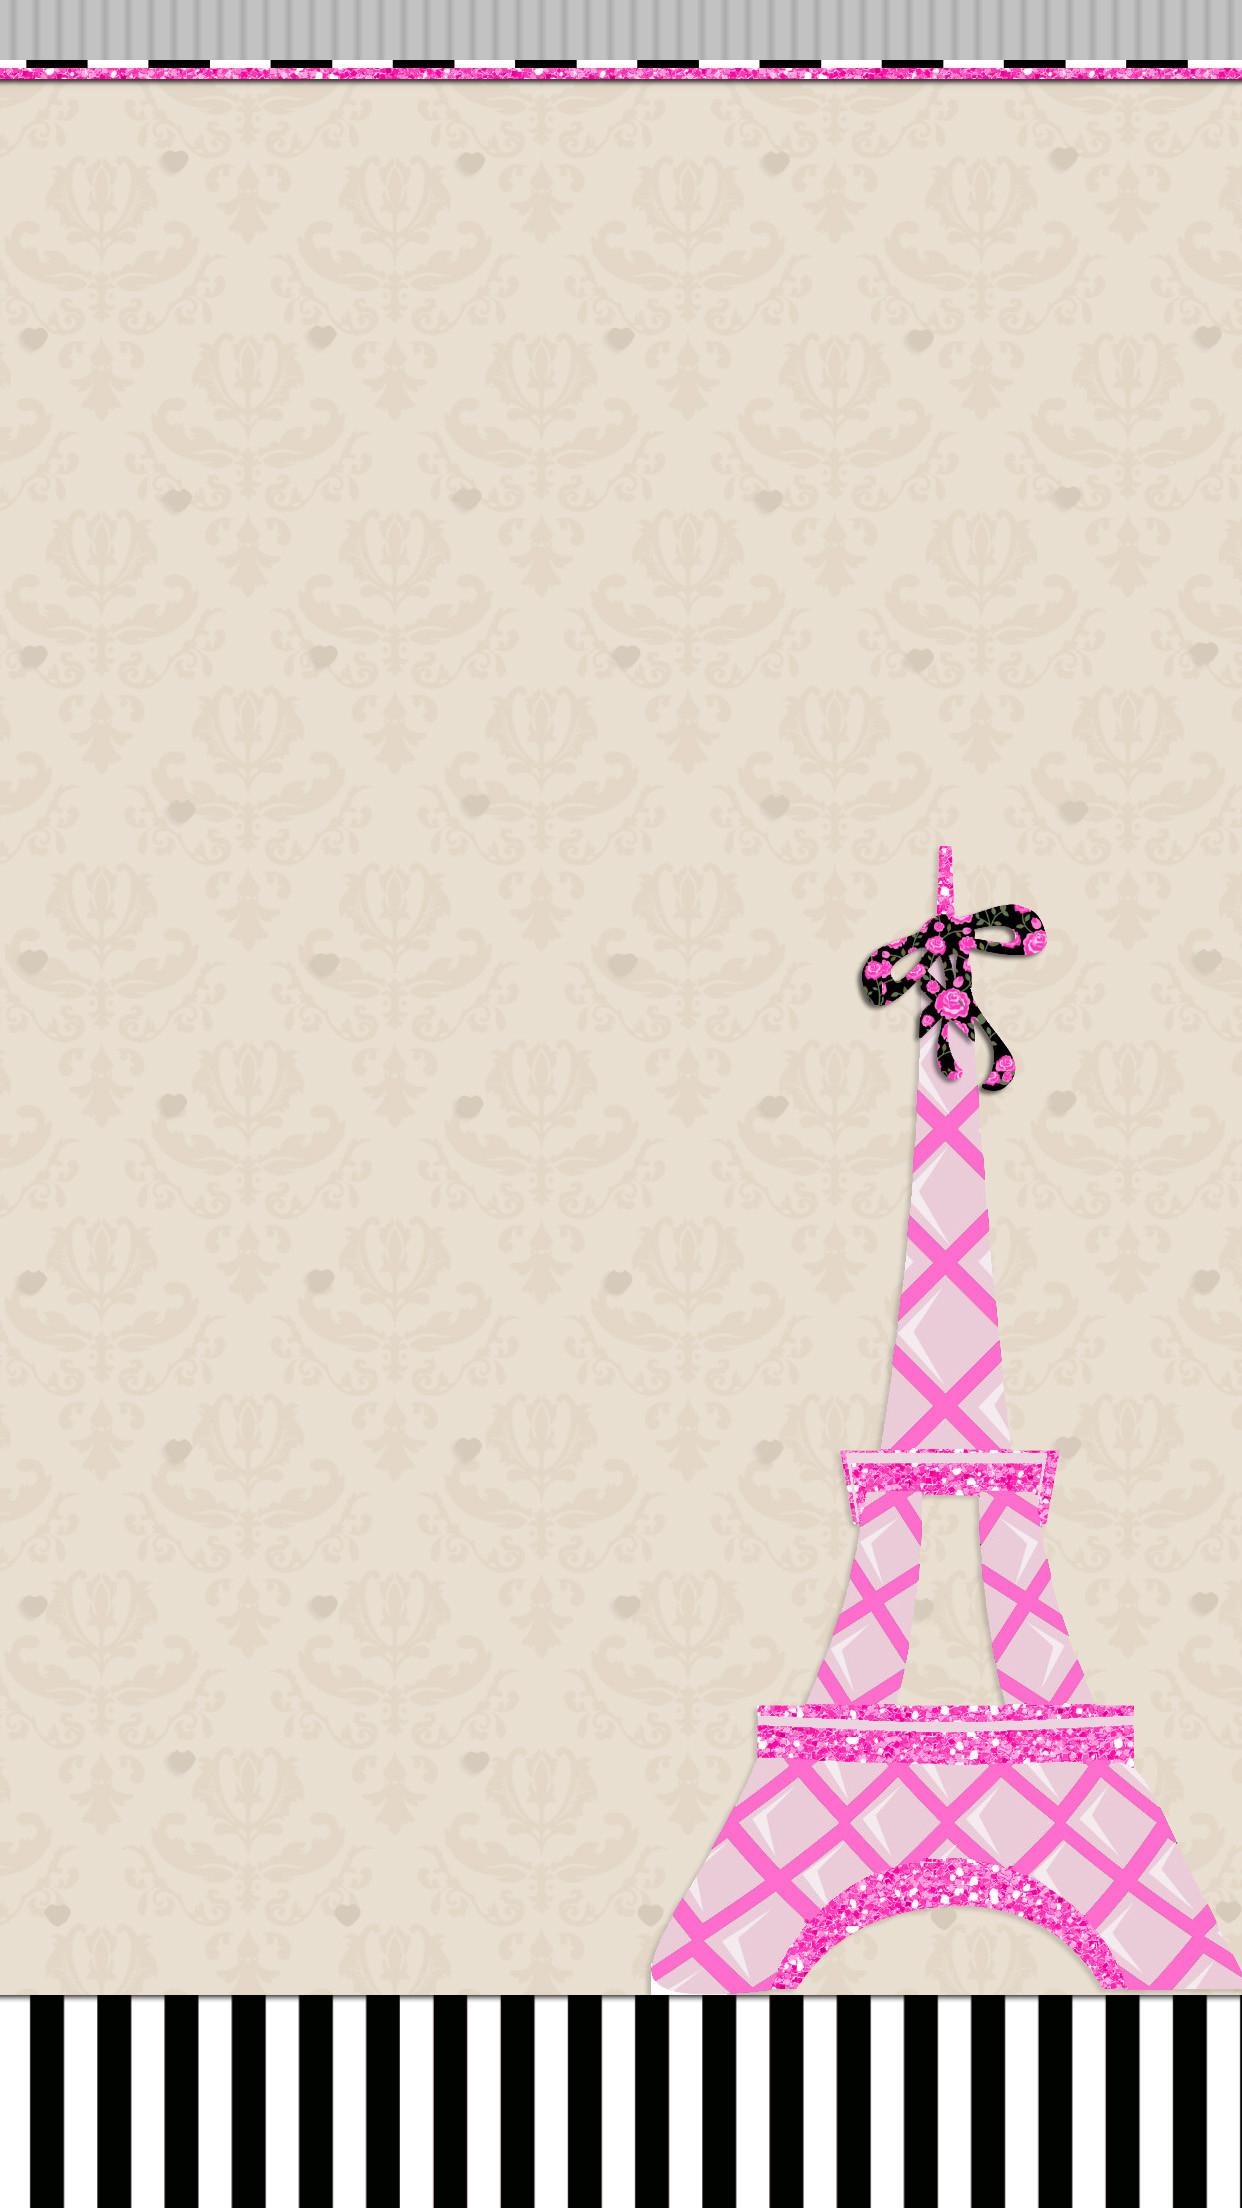 1920x1200 Tumblr Wallpaper Cute Pattern Image Gallery